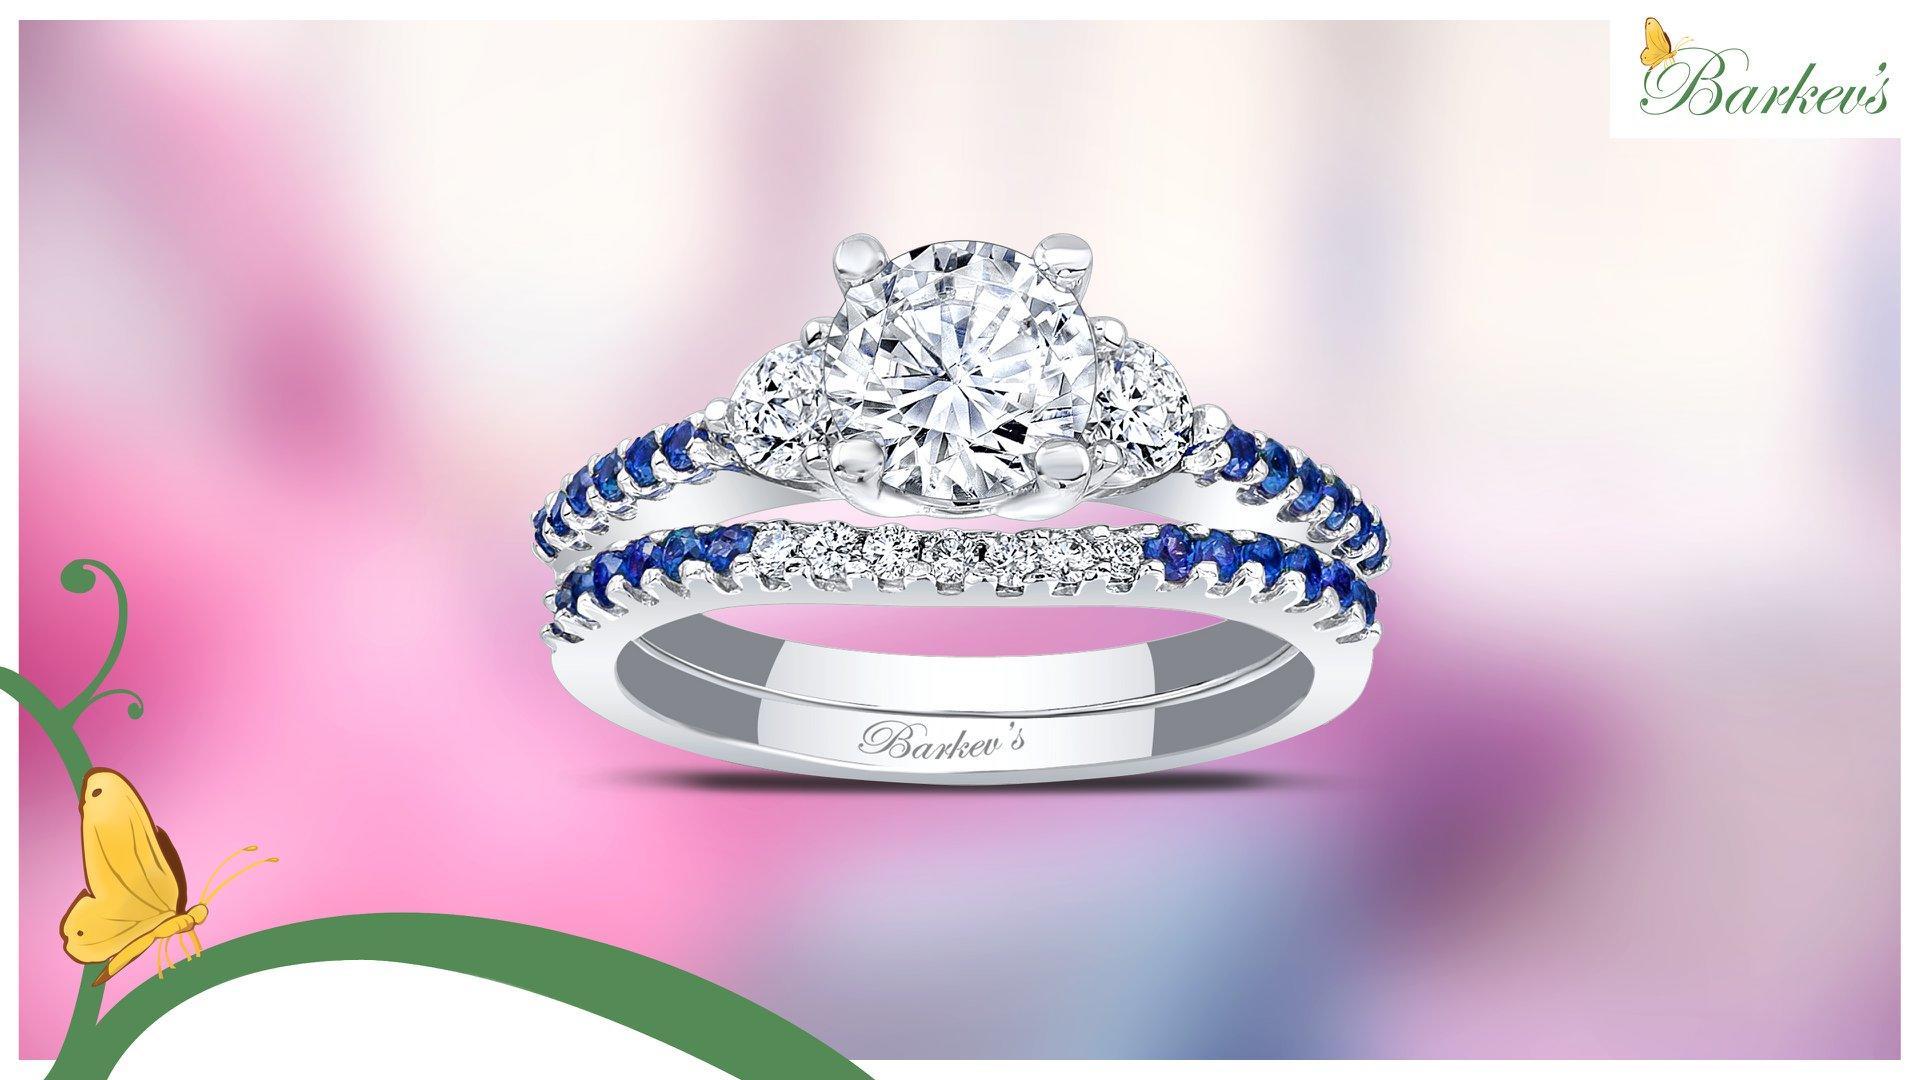 Bulow Jewelers image 3